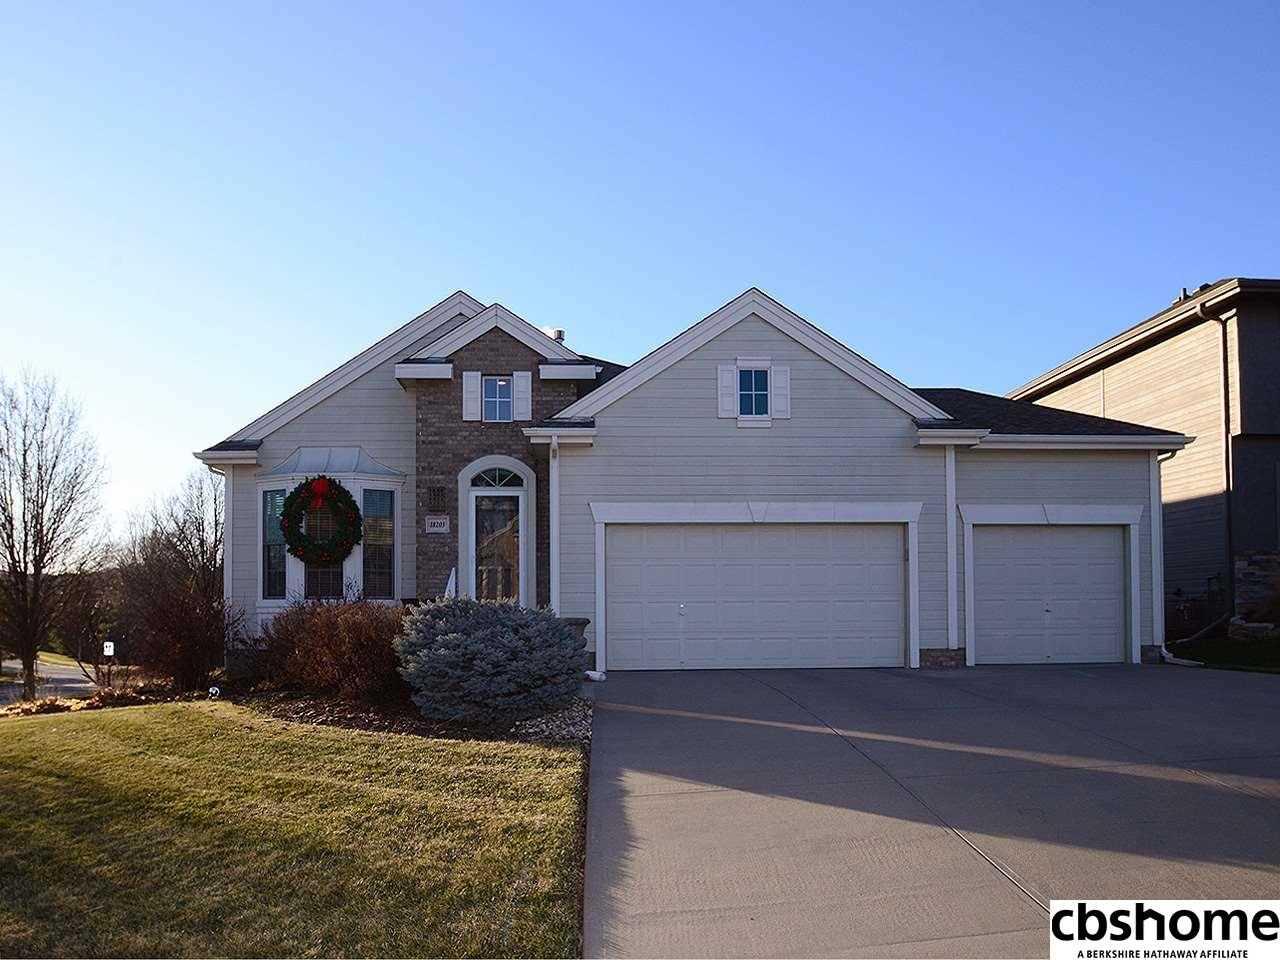 18203 Farnam Omaha, NE 68022 | MLS 21801535 Photo 1